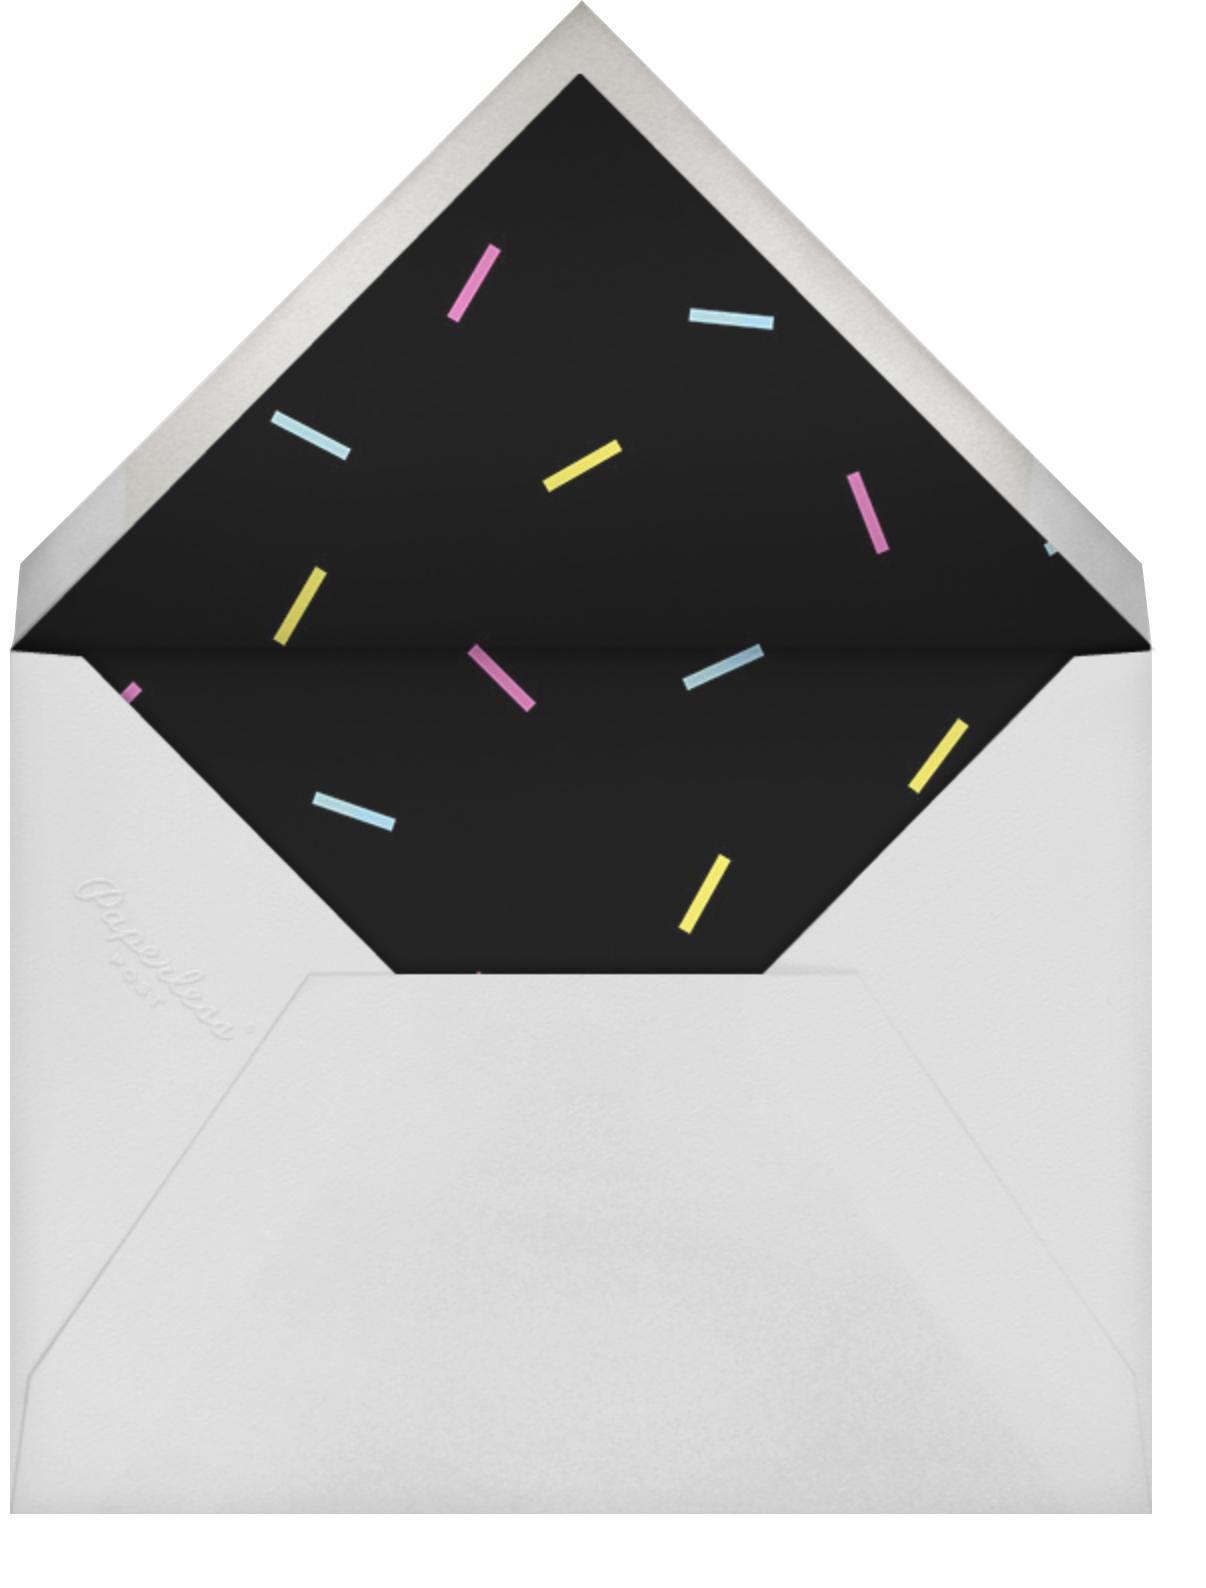 Milestone Portrait (One Hundred) - Celadon - Paperless Post - 100 day celebrations - envelope back